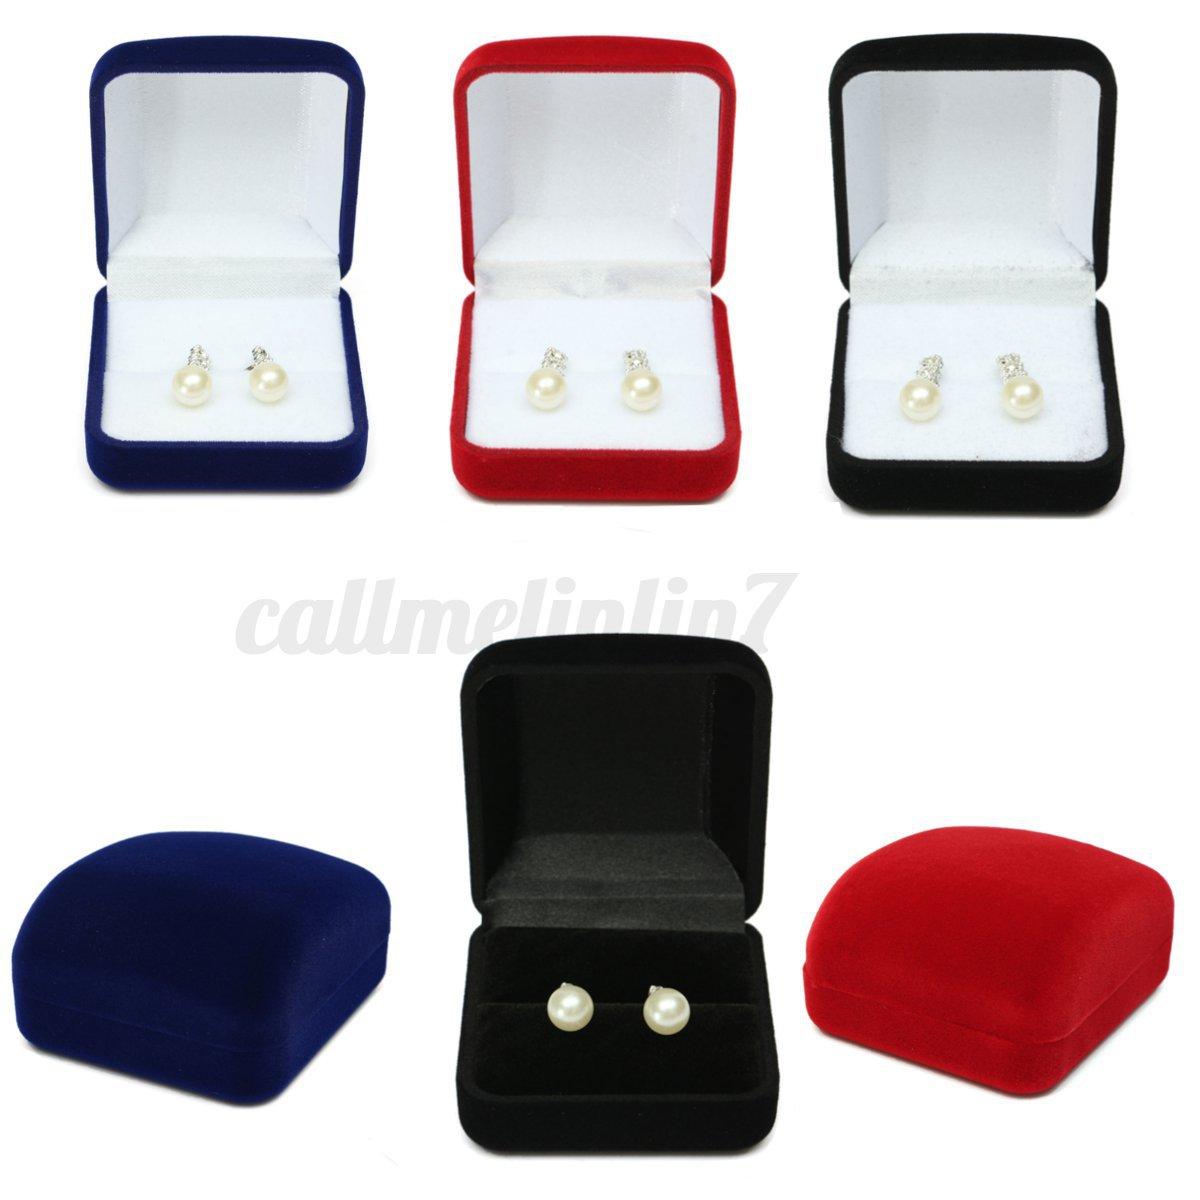 Ecrin bague anneau velours bo te bijoux boucle d 39 oreille - Boite a bijoux boucle d oreille ...